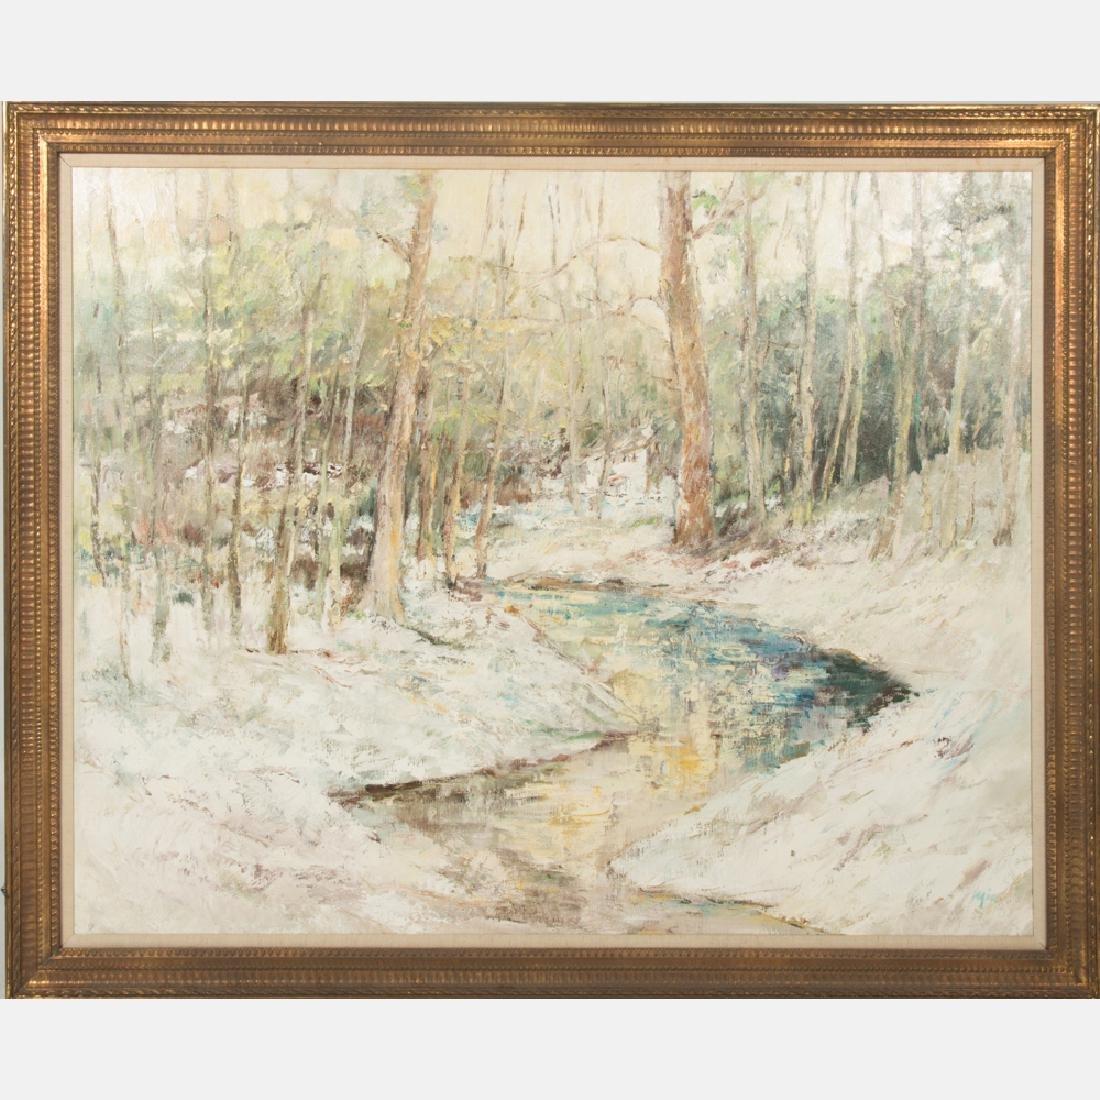 Mia (20th Century) Forest Scene, Oil on canvas,